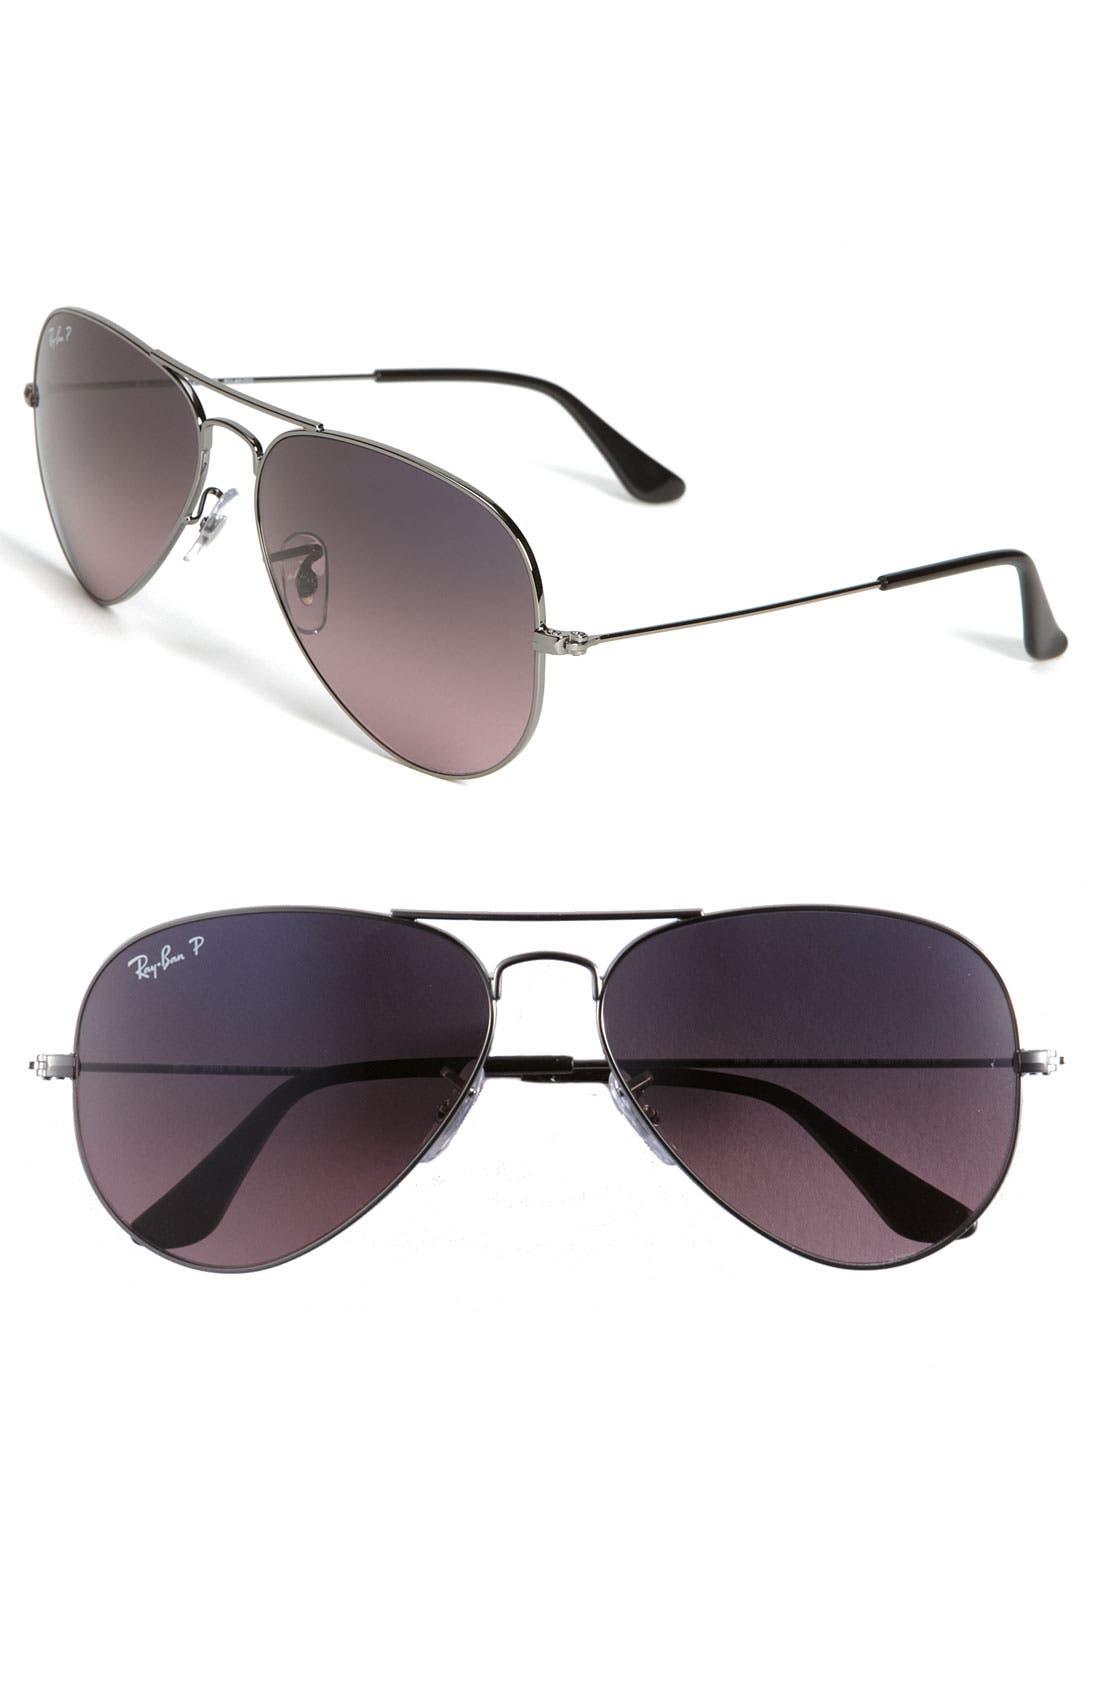 Alternate Image 1 Selected - Ray-Ban Original Aviator 58mm Polarized Sunglasses